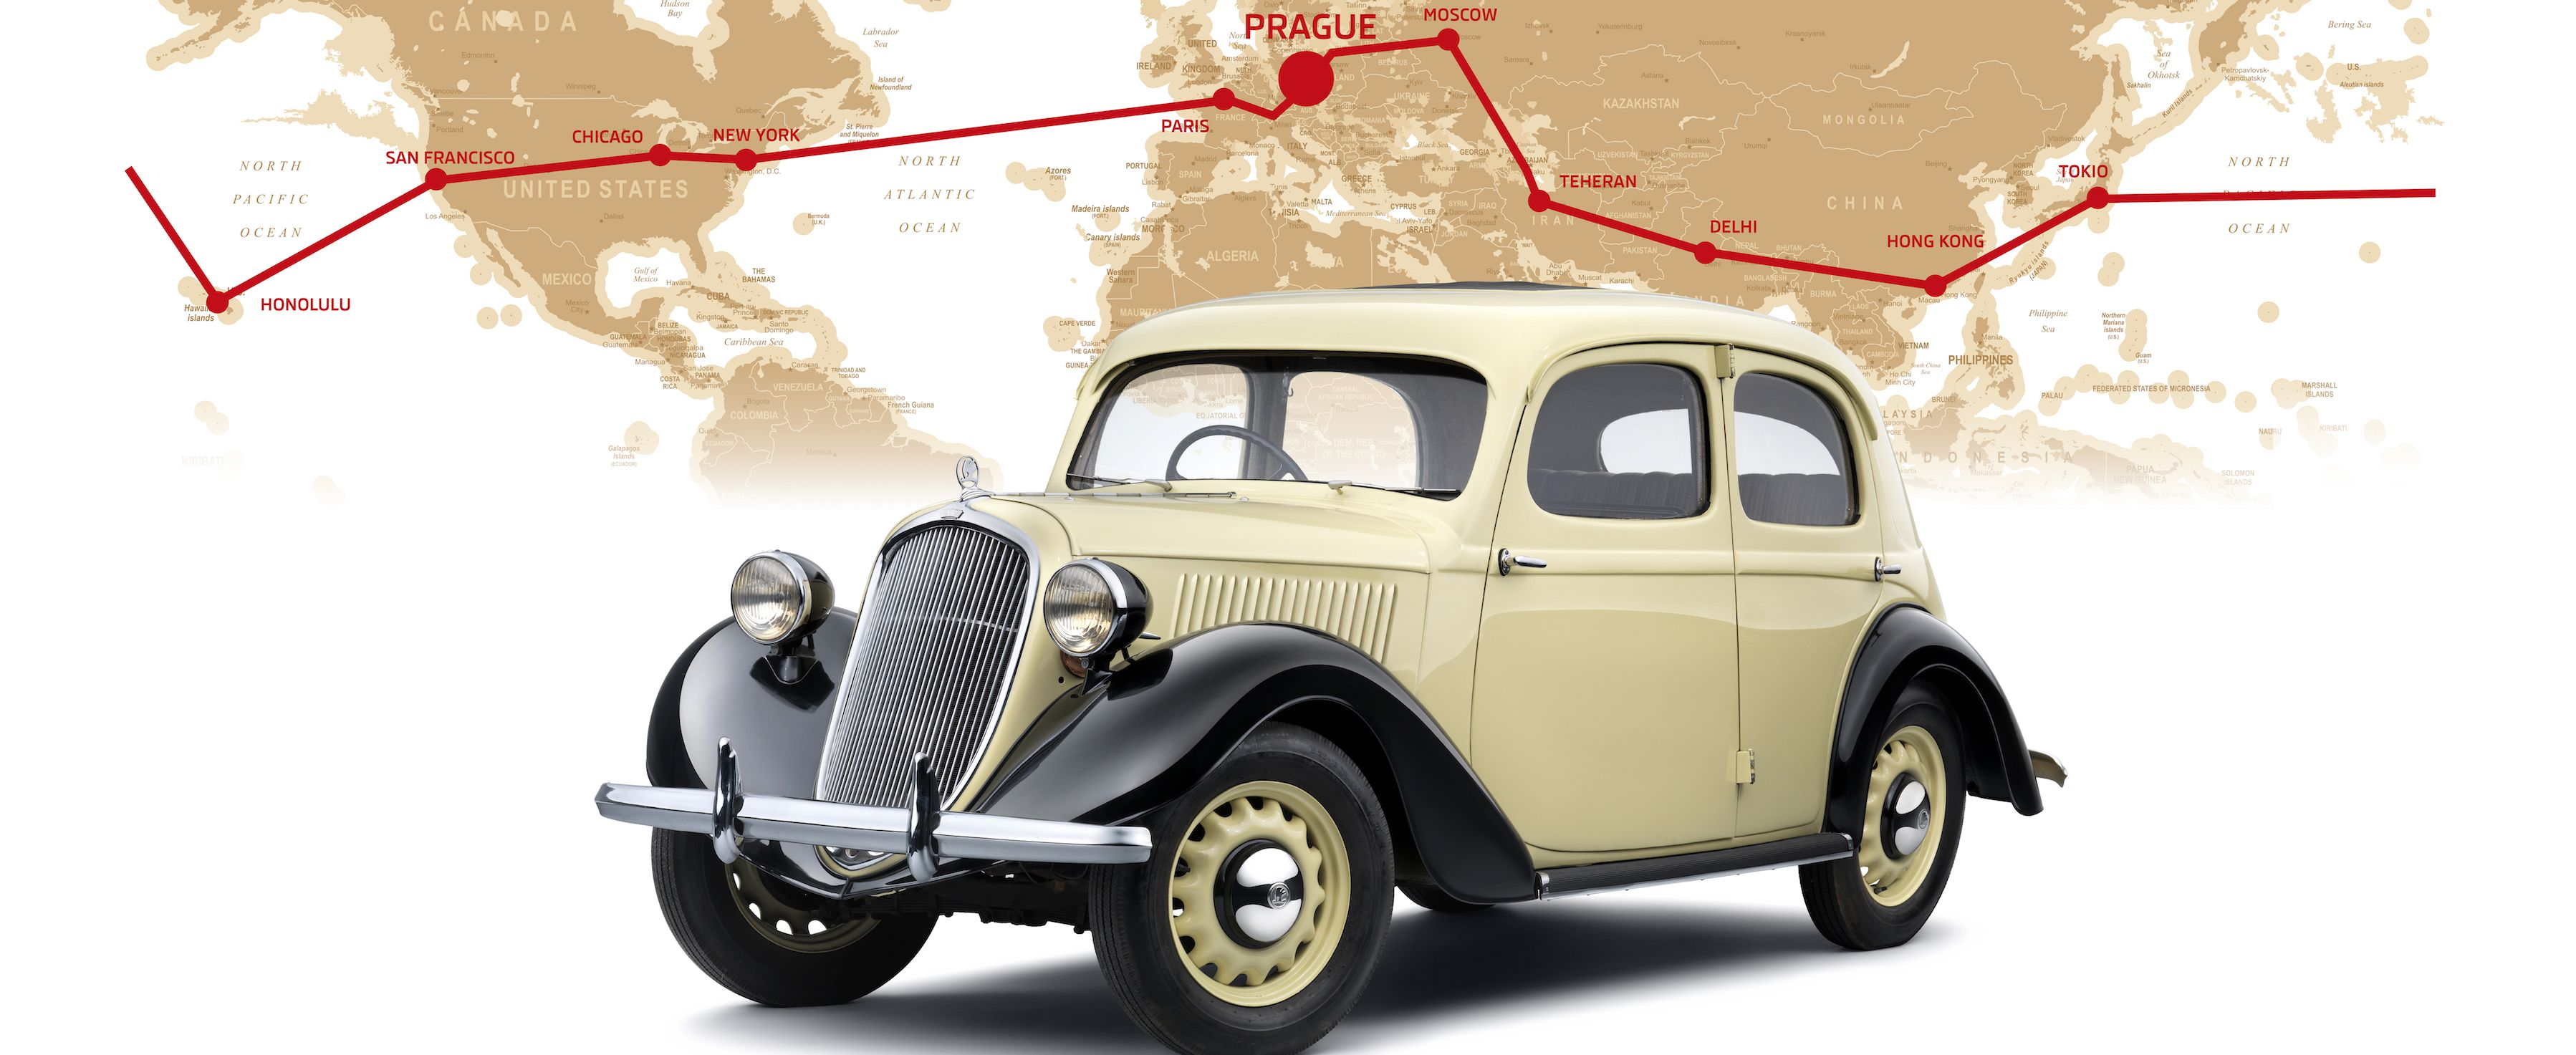 1935 Skoda Rapid typ 901 EN 1